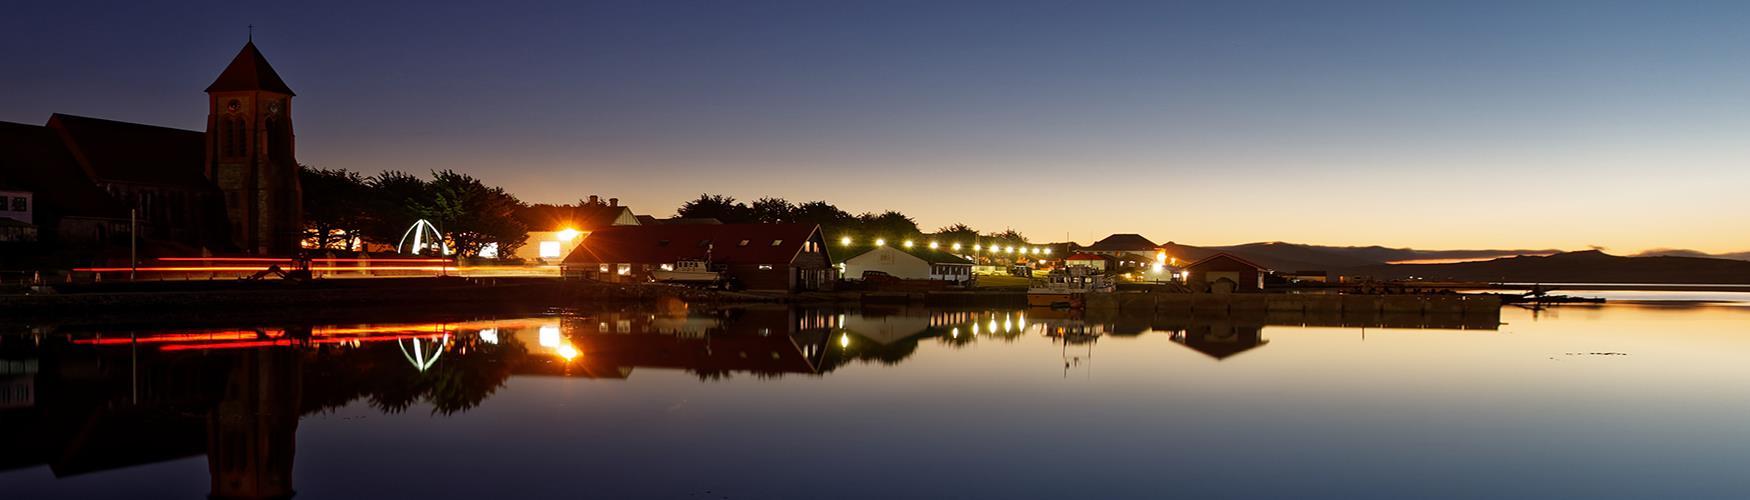 Stanley evening, Falkland Islands